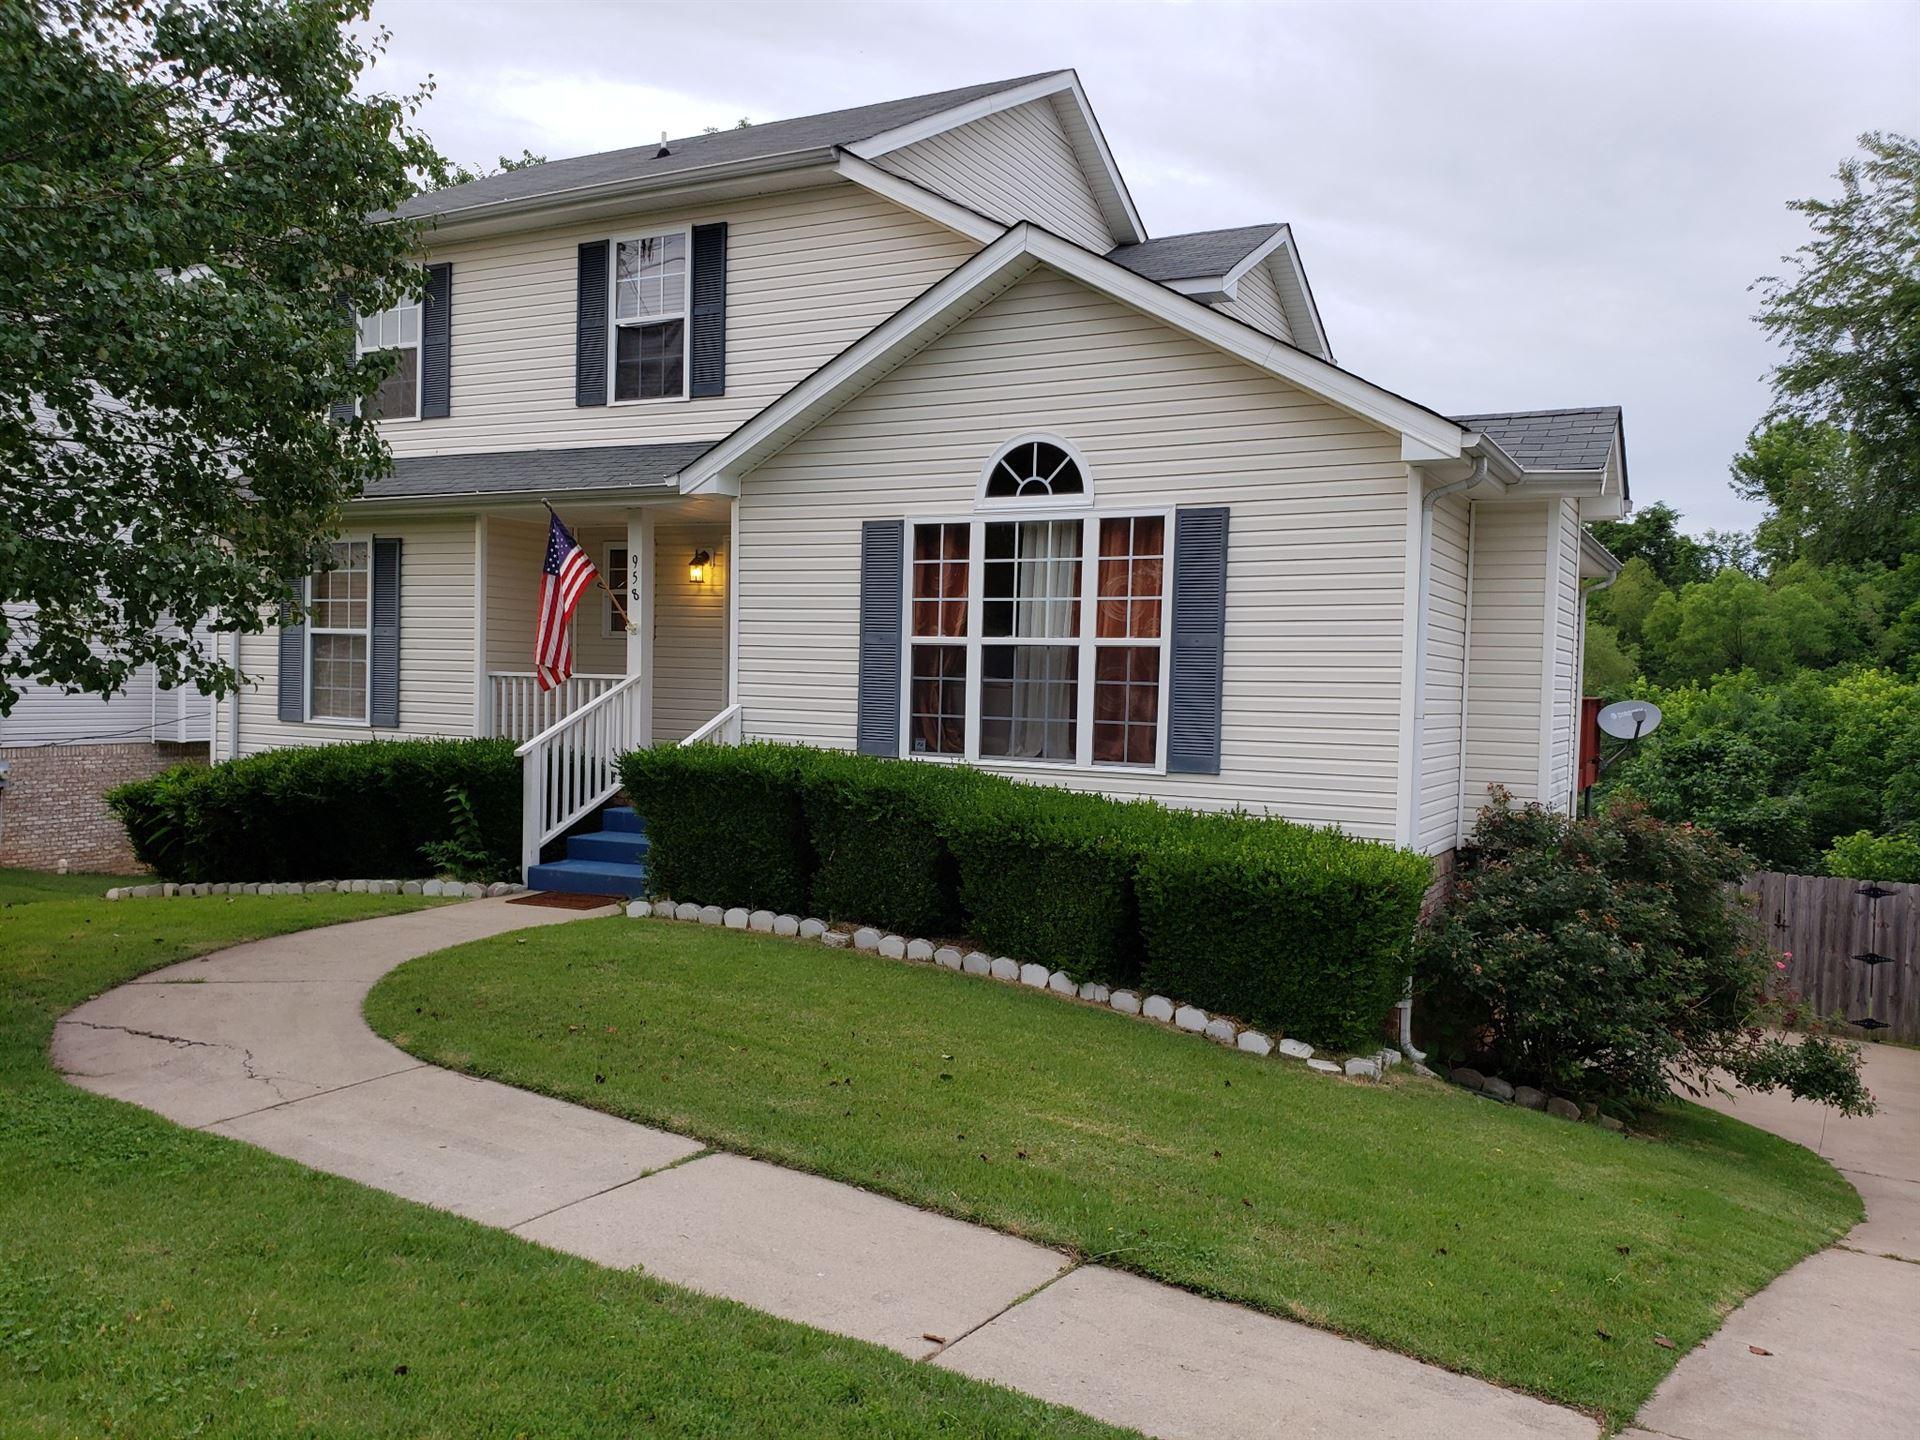 958 Hedge Apple Dr, Clarksville, TN 37040 - MLS#: 2261263